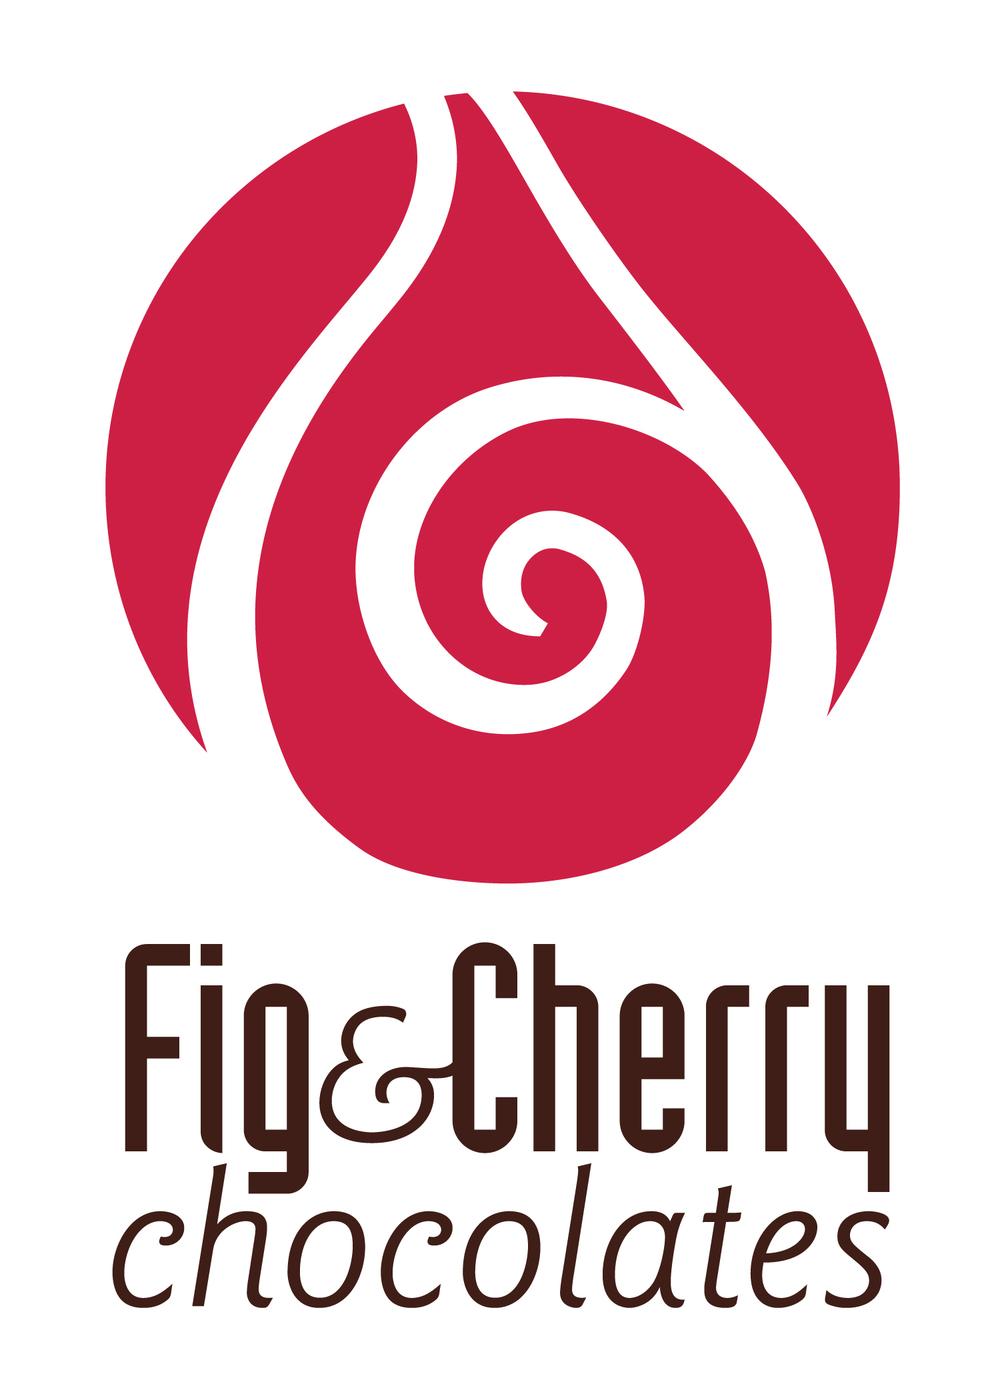 FigCherry_logo_300dpi_large.jpg